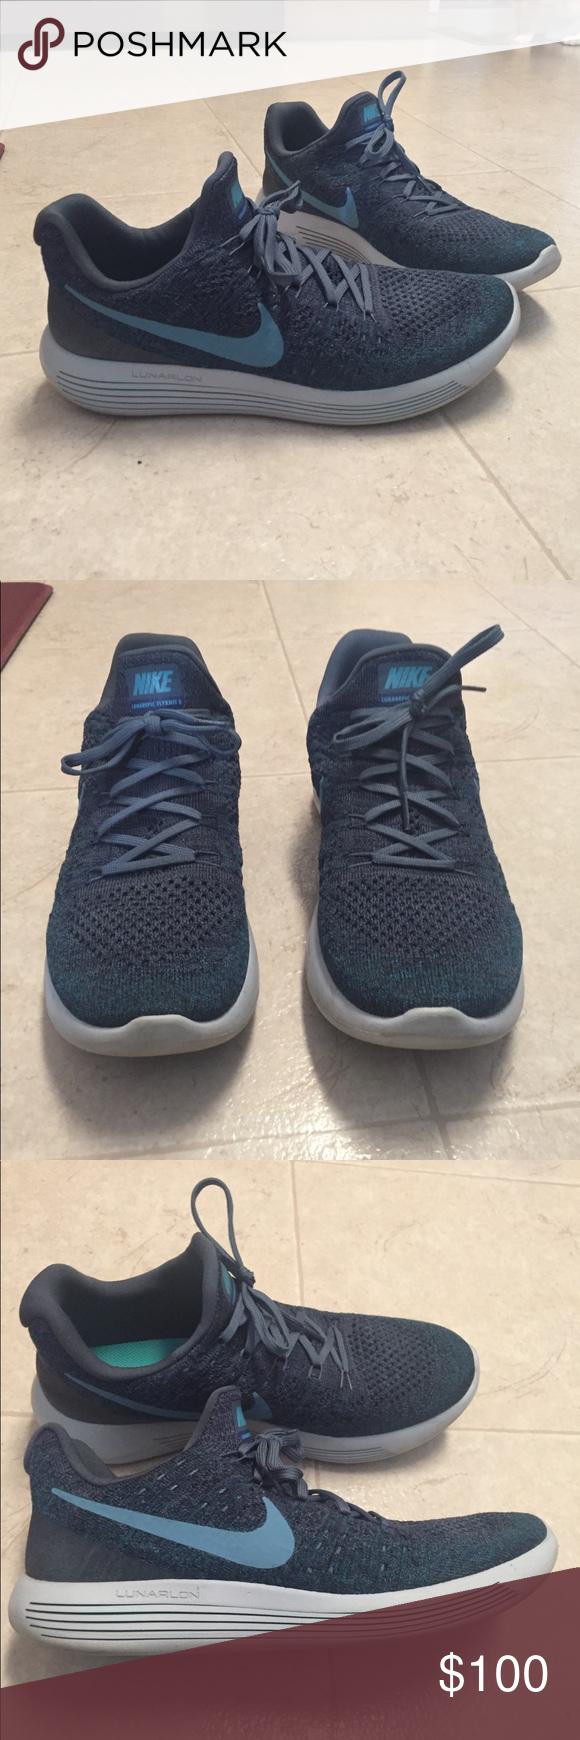 graffiare antibiotici Millimetro  MENS NIKE LUNARLON RUNNING SHOE •Nike Lunarlon running shoes •size men's 10  1/2 •barley worn, great condition •no … | Nike men, Running shoes, Running  shoes nike